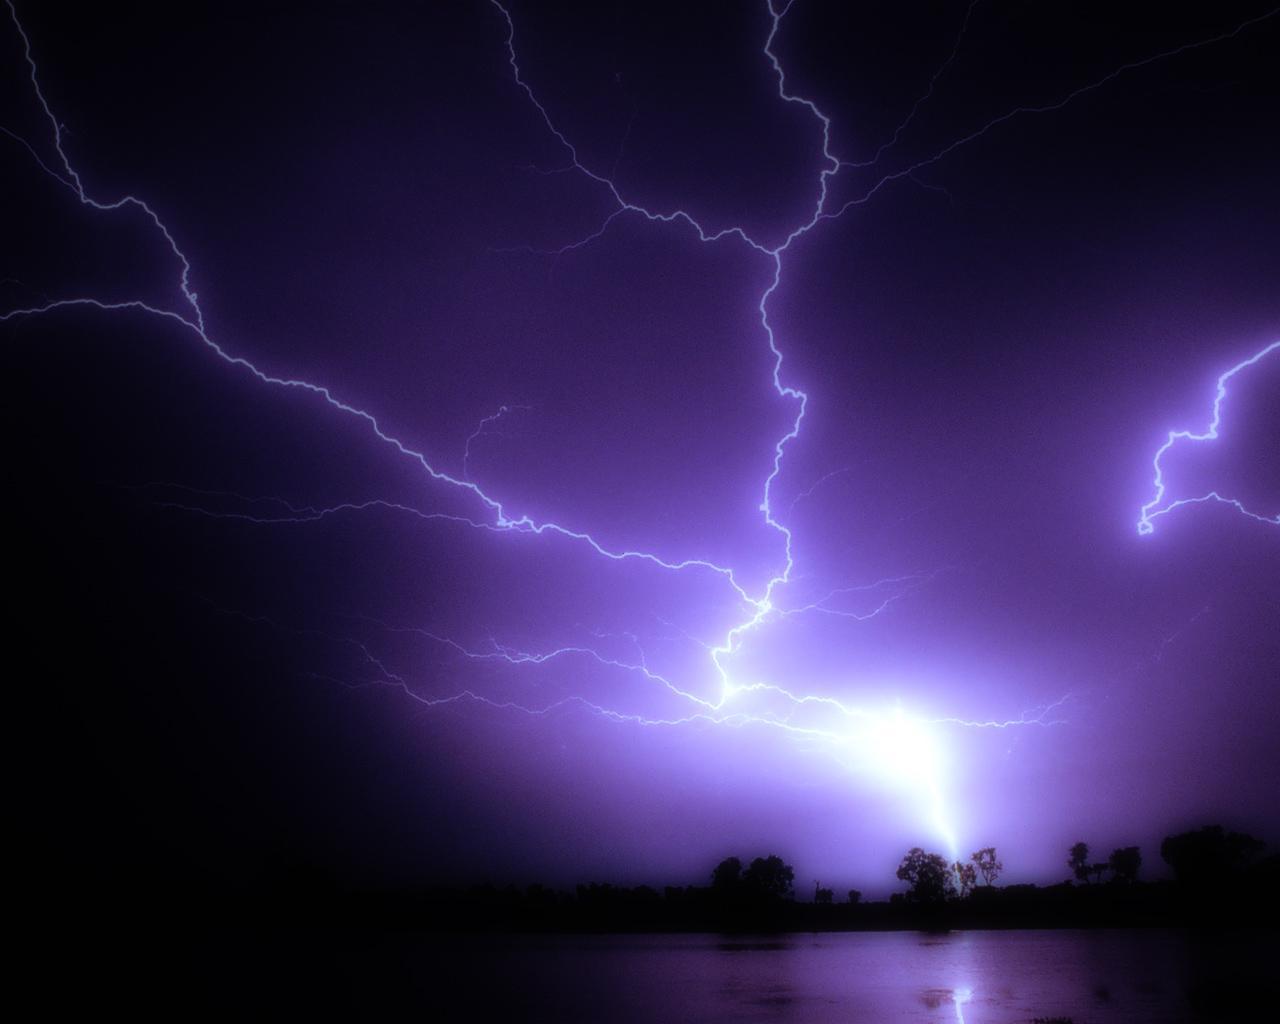 Lightning Bolts Wallpaper Lightning Bolts Wallpaper 1280x1024